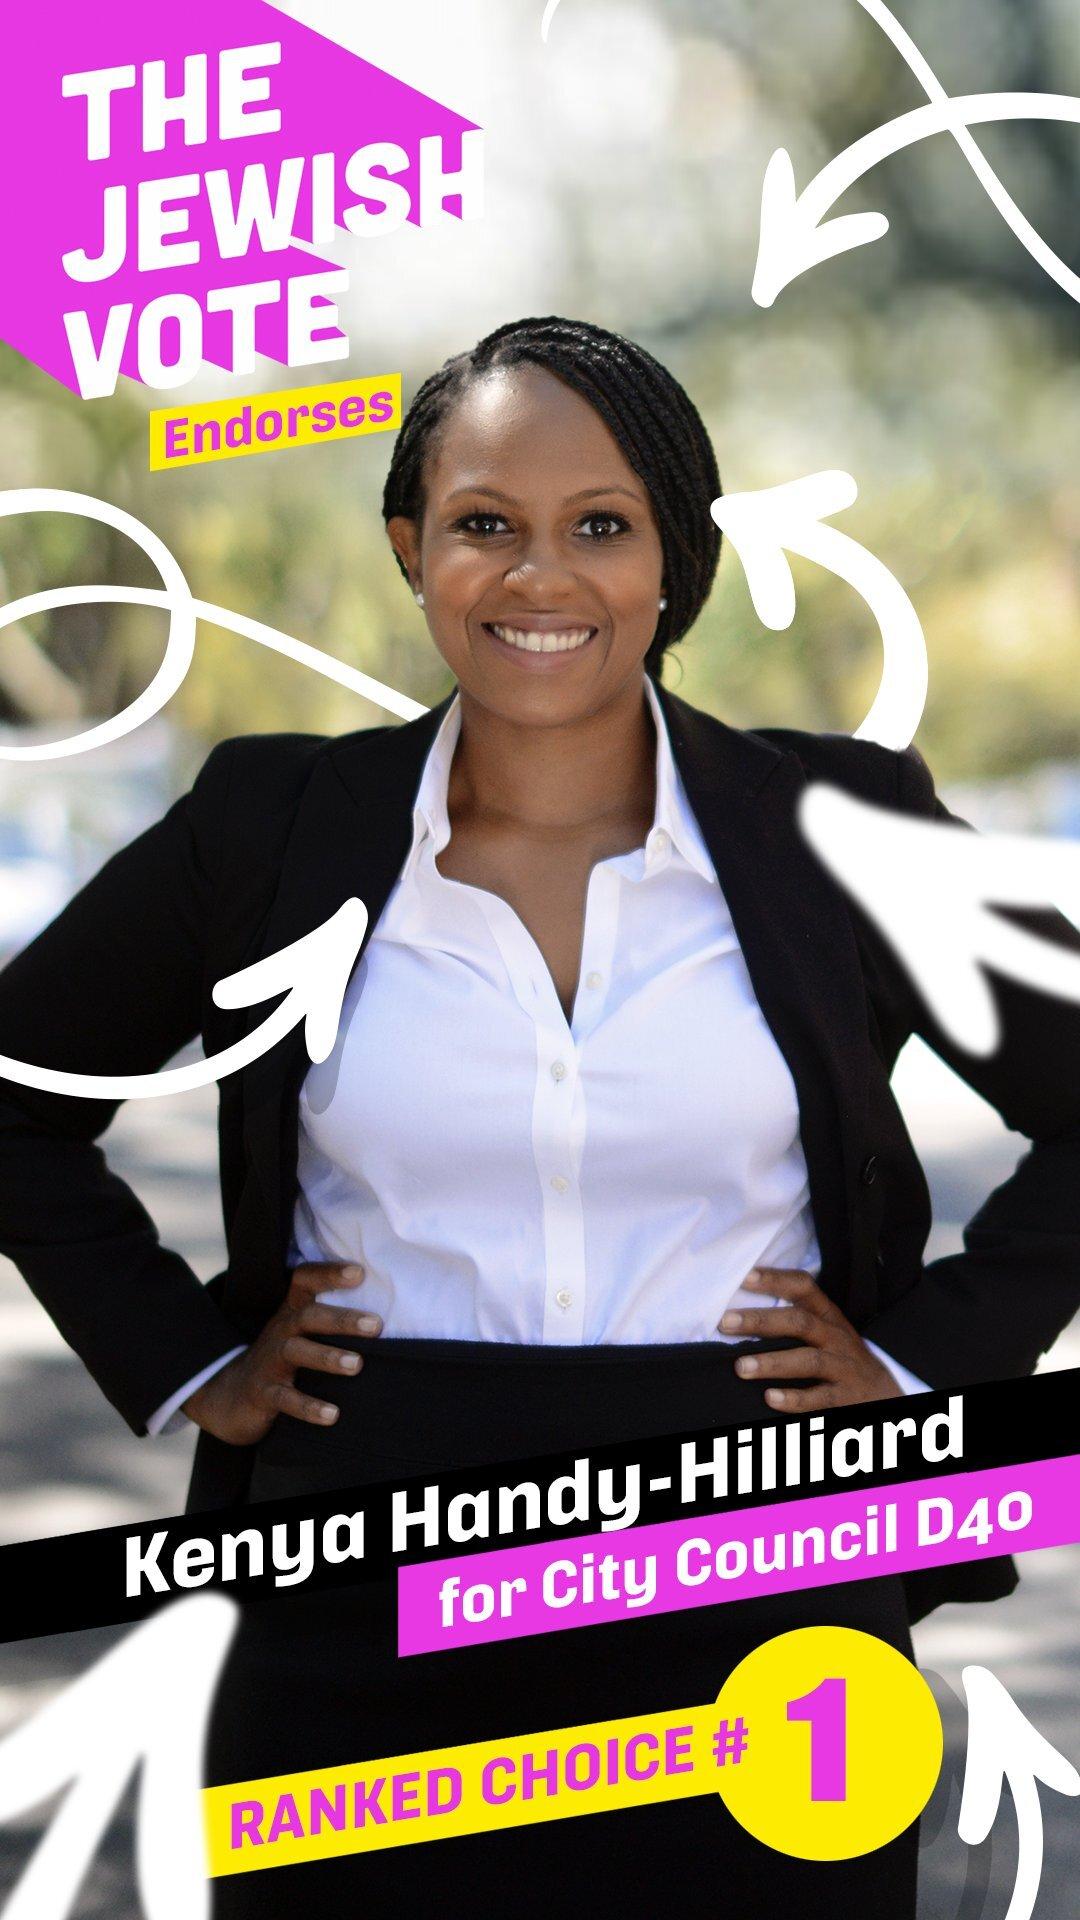 Kenya Handy-Hilliard